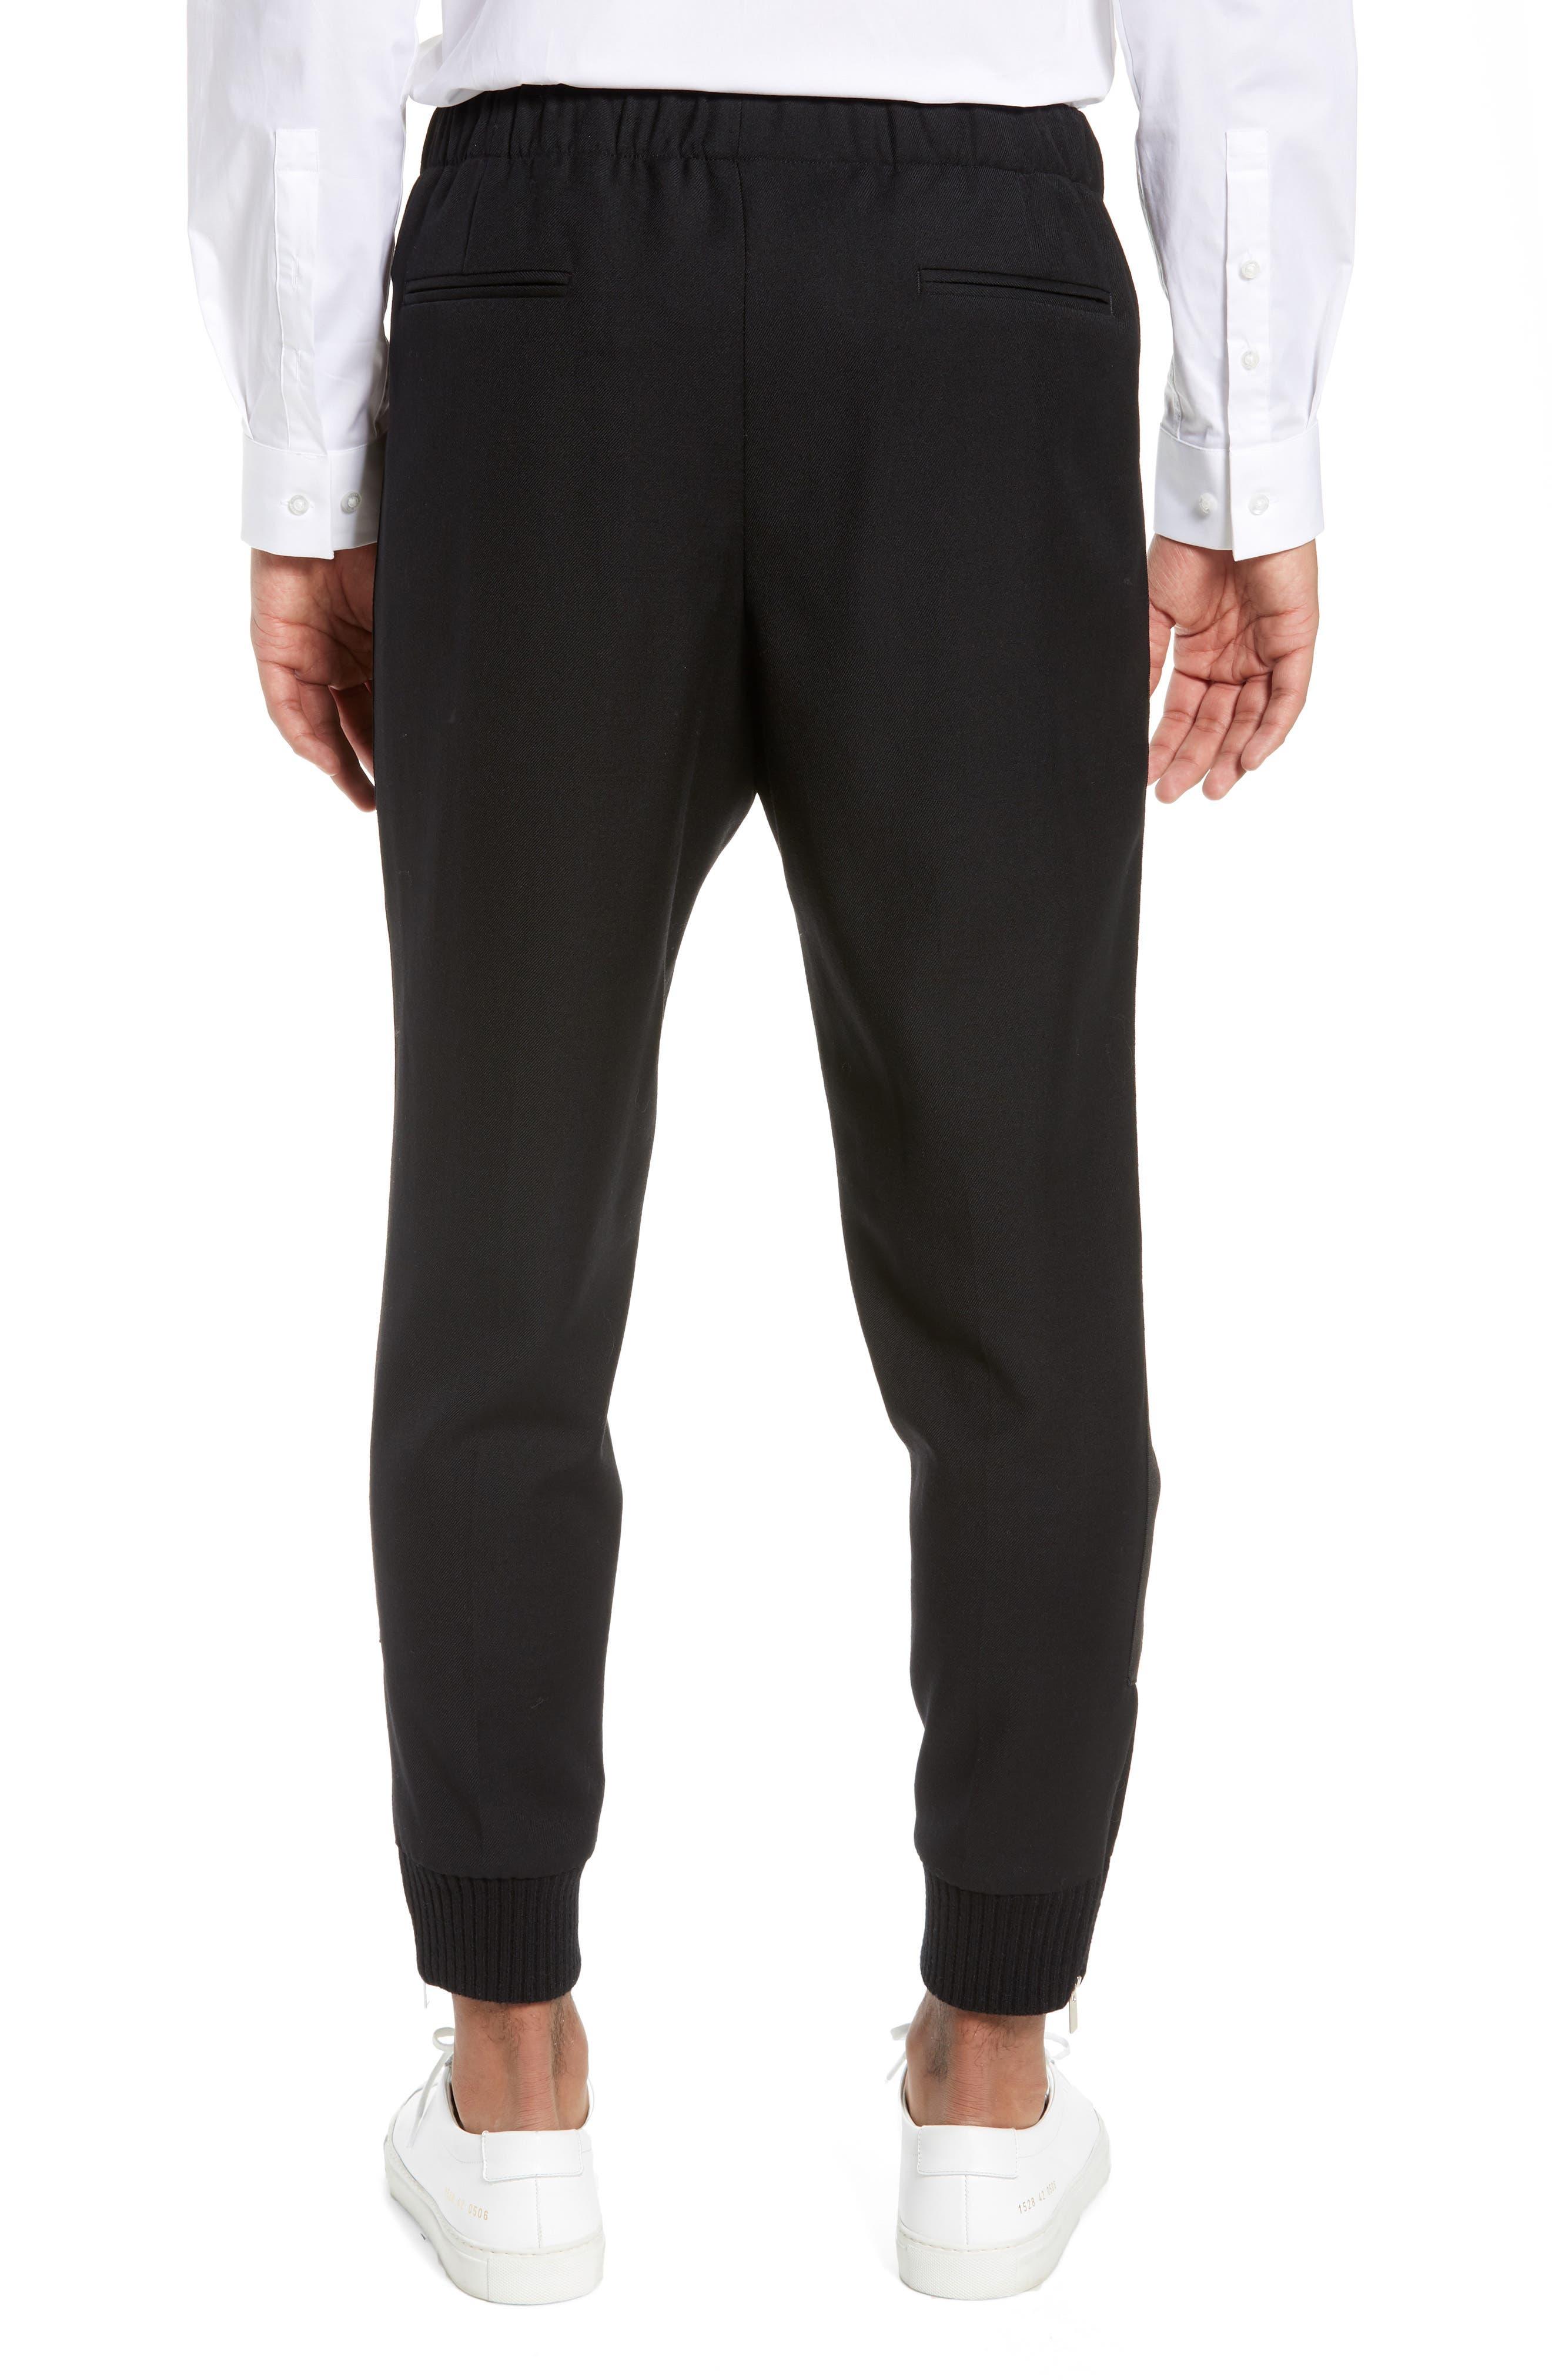 THE KOOPLES, Straight Leg Woven Jogger Pants, Alternate thumbnail 2, color, BLACK